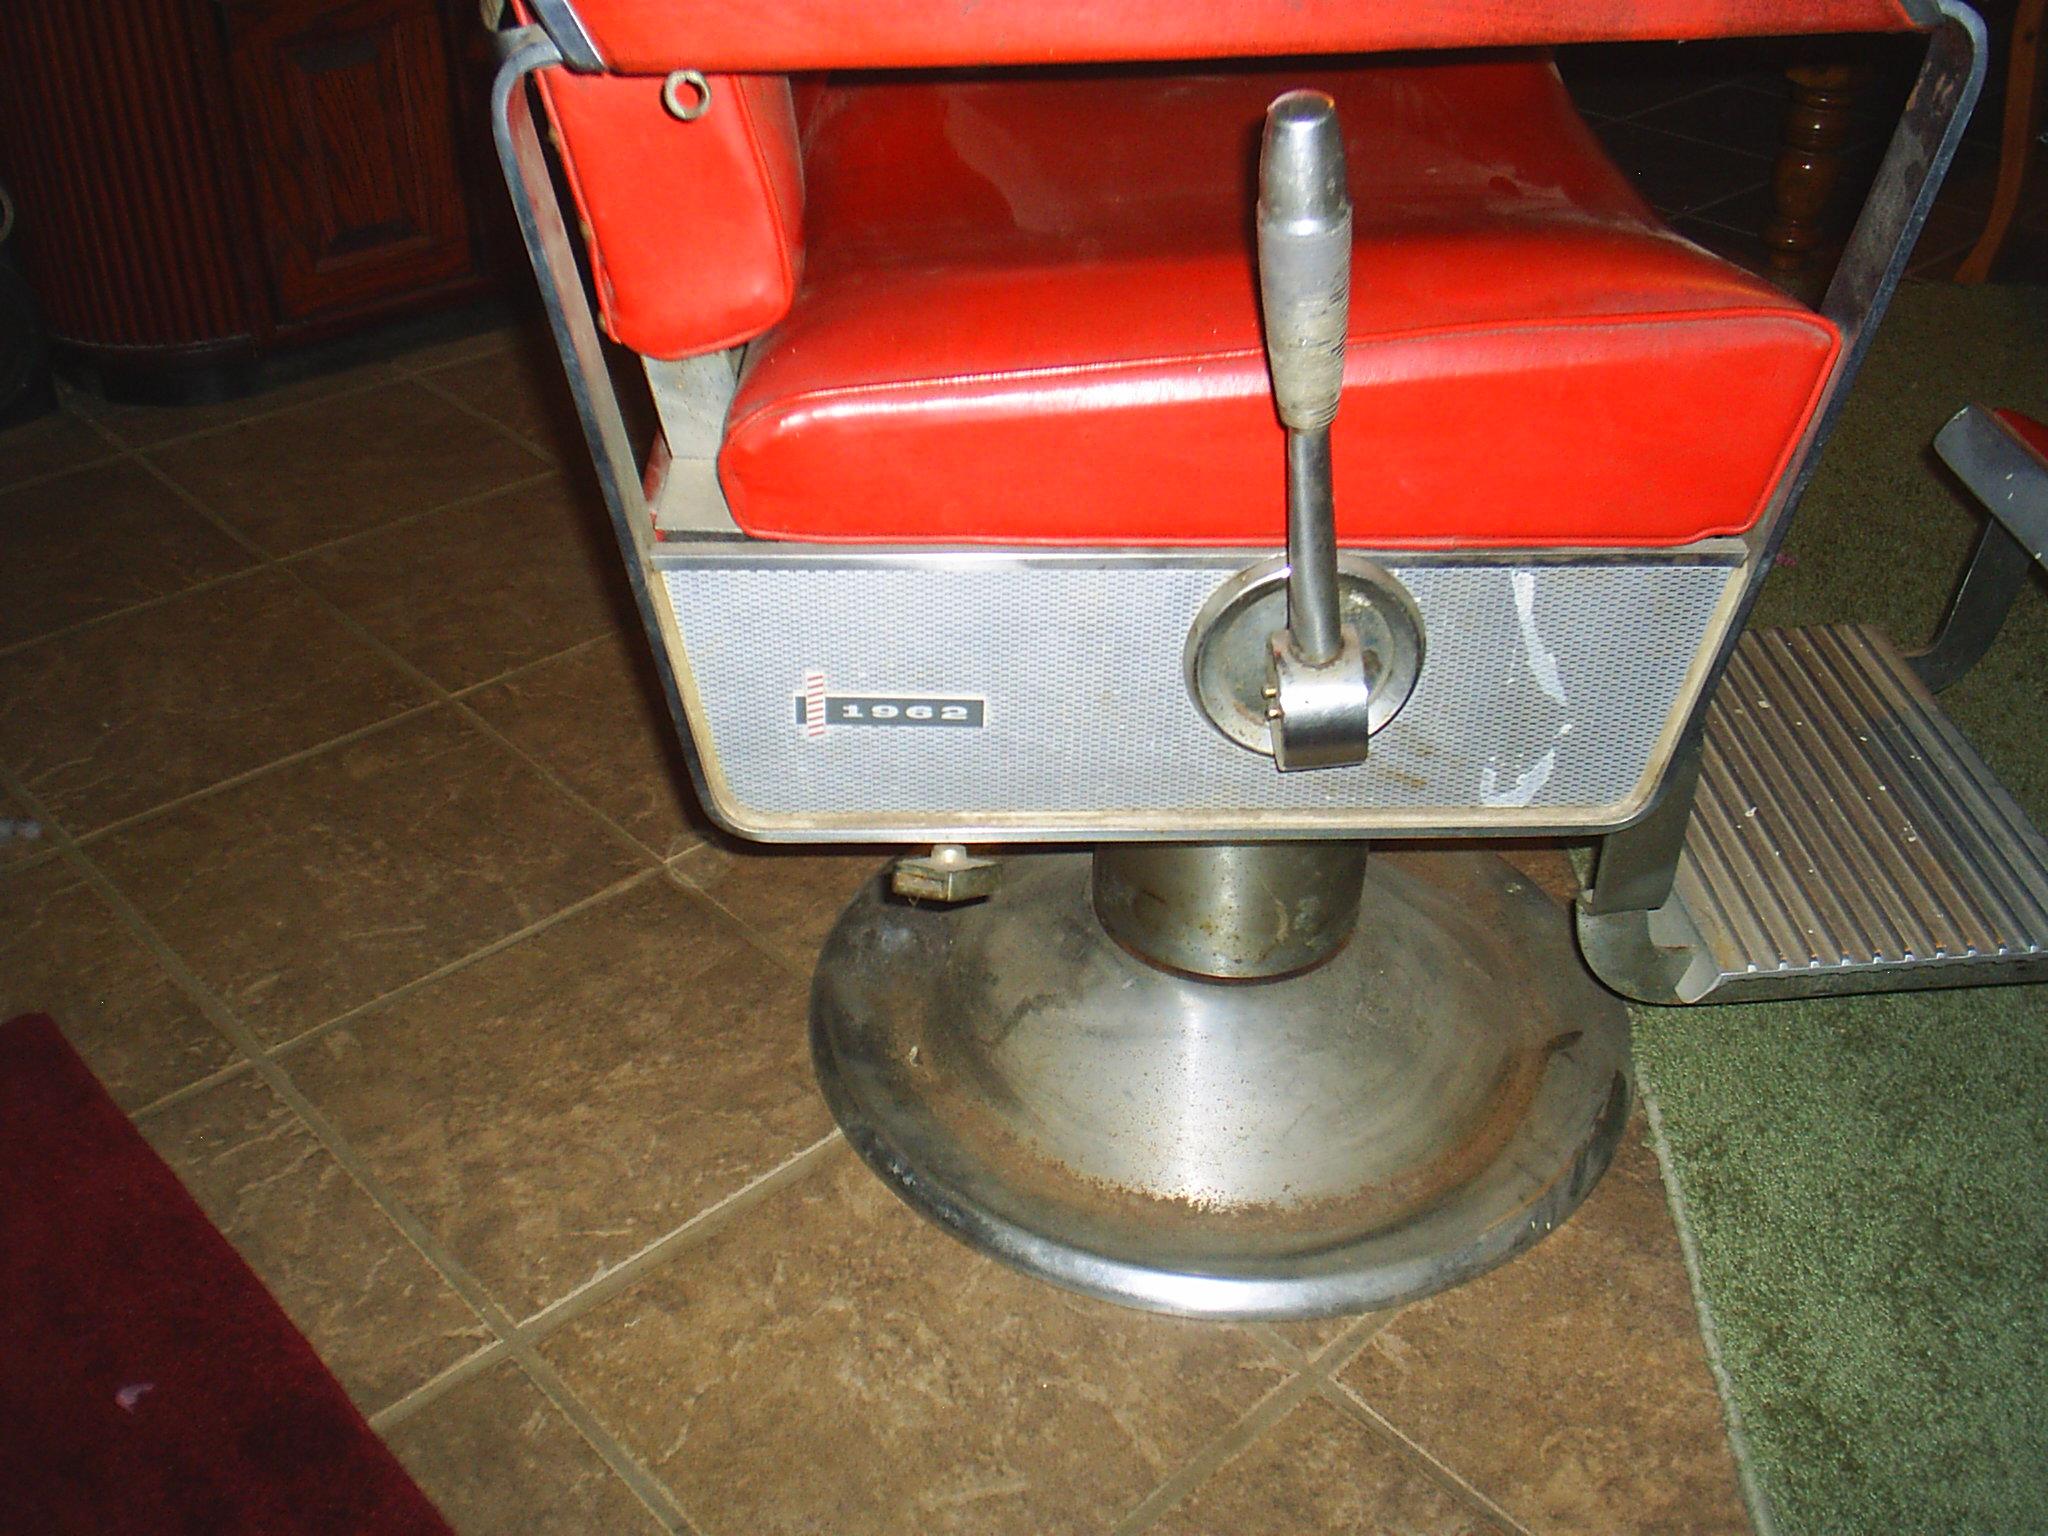 1962 Kochs Barber Chair (Red)